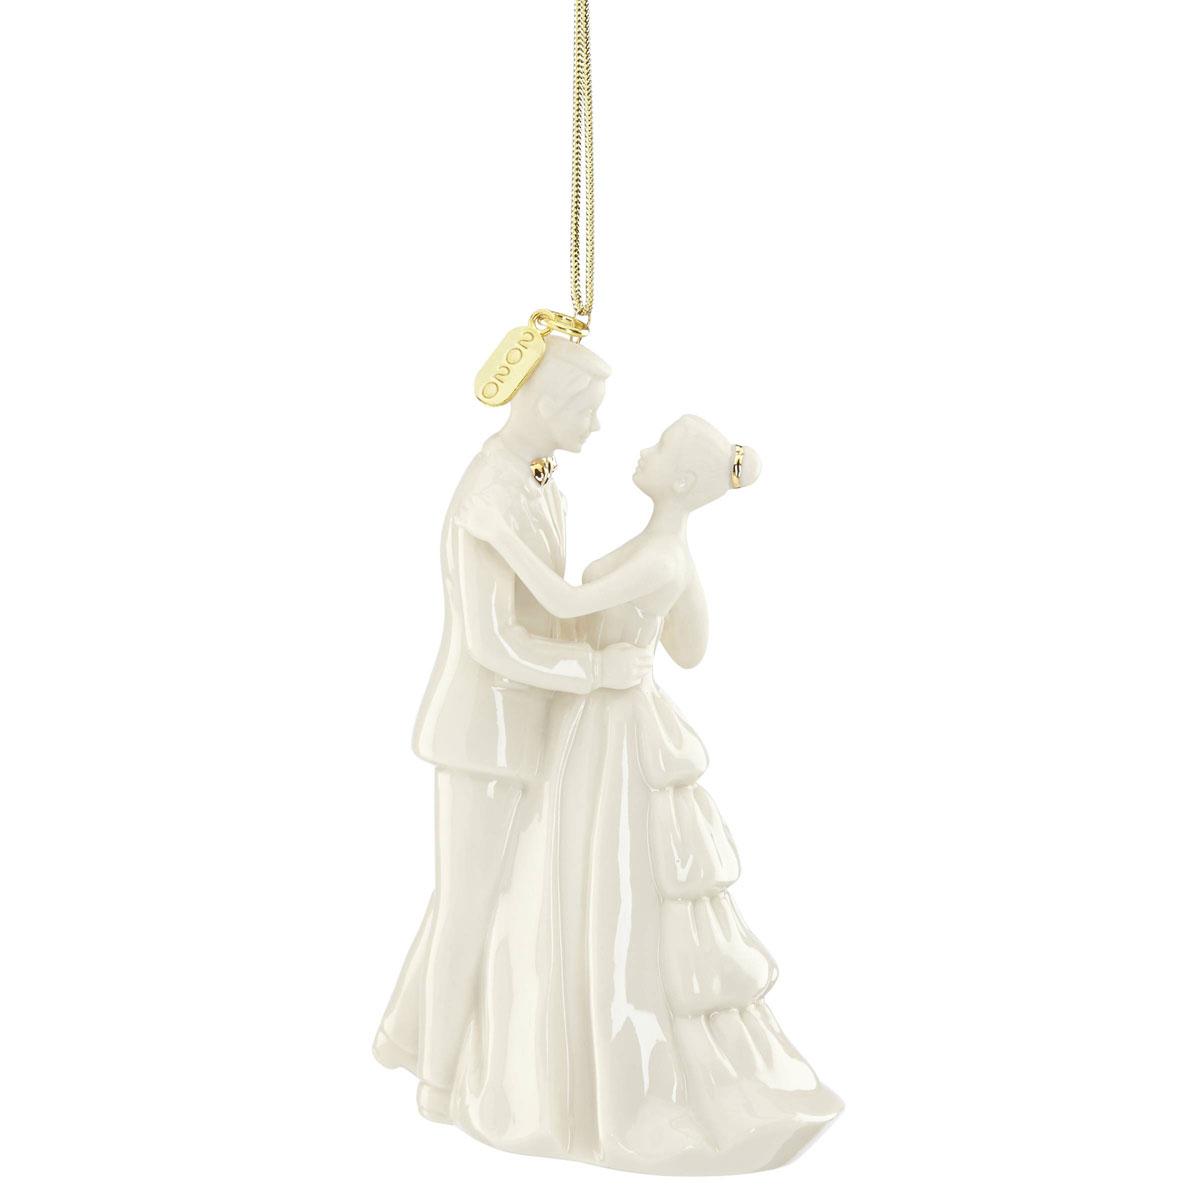 Lenox Bride and Groom 2020 Ornament